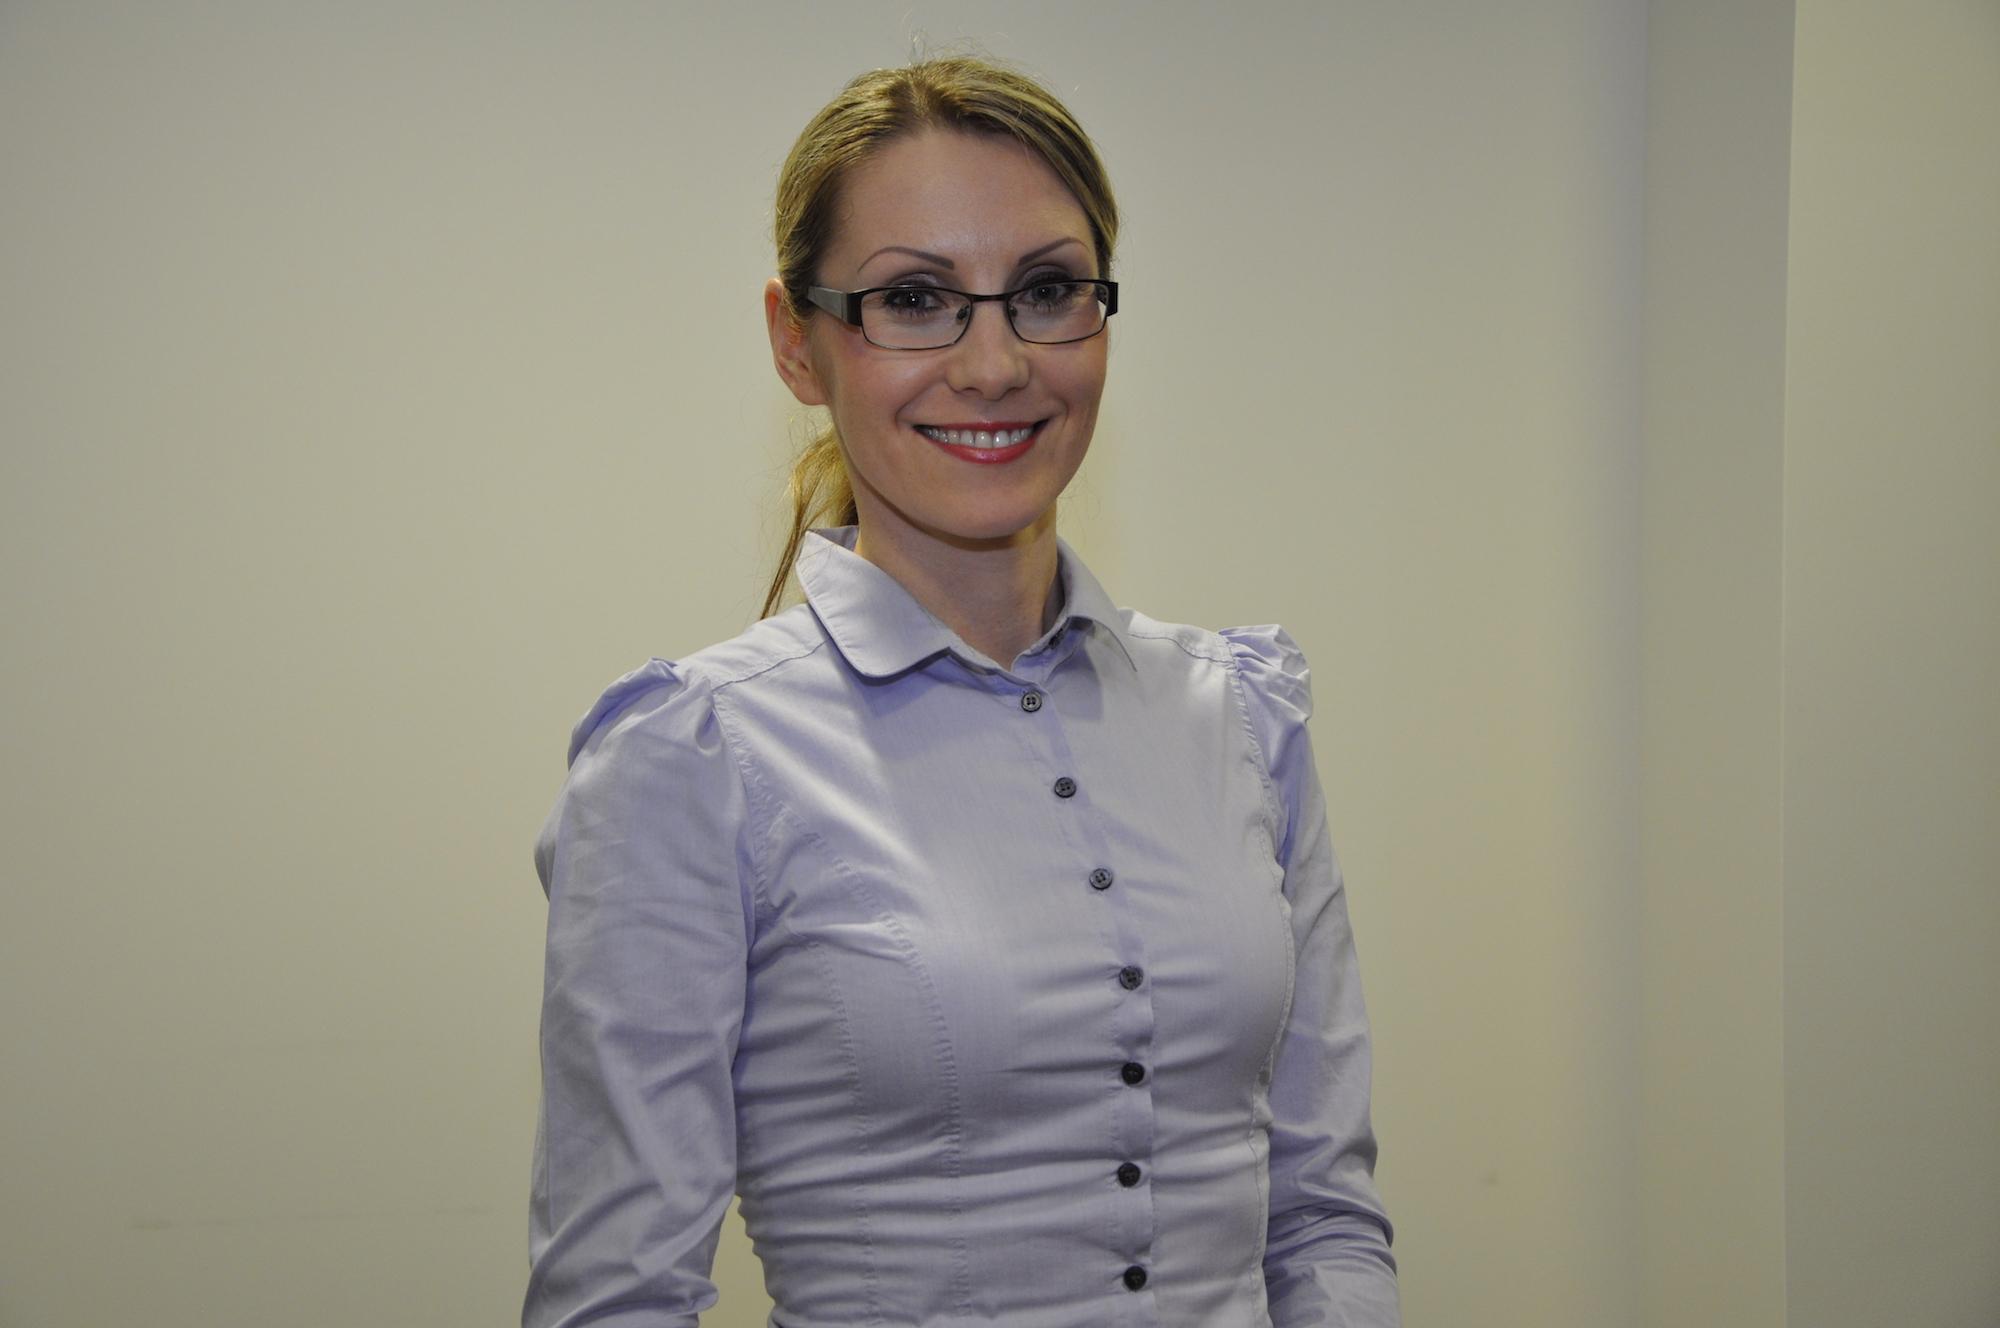 Nerida Antoniou, Lexington Catering - Catering Manager